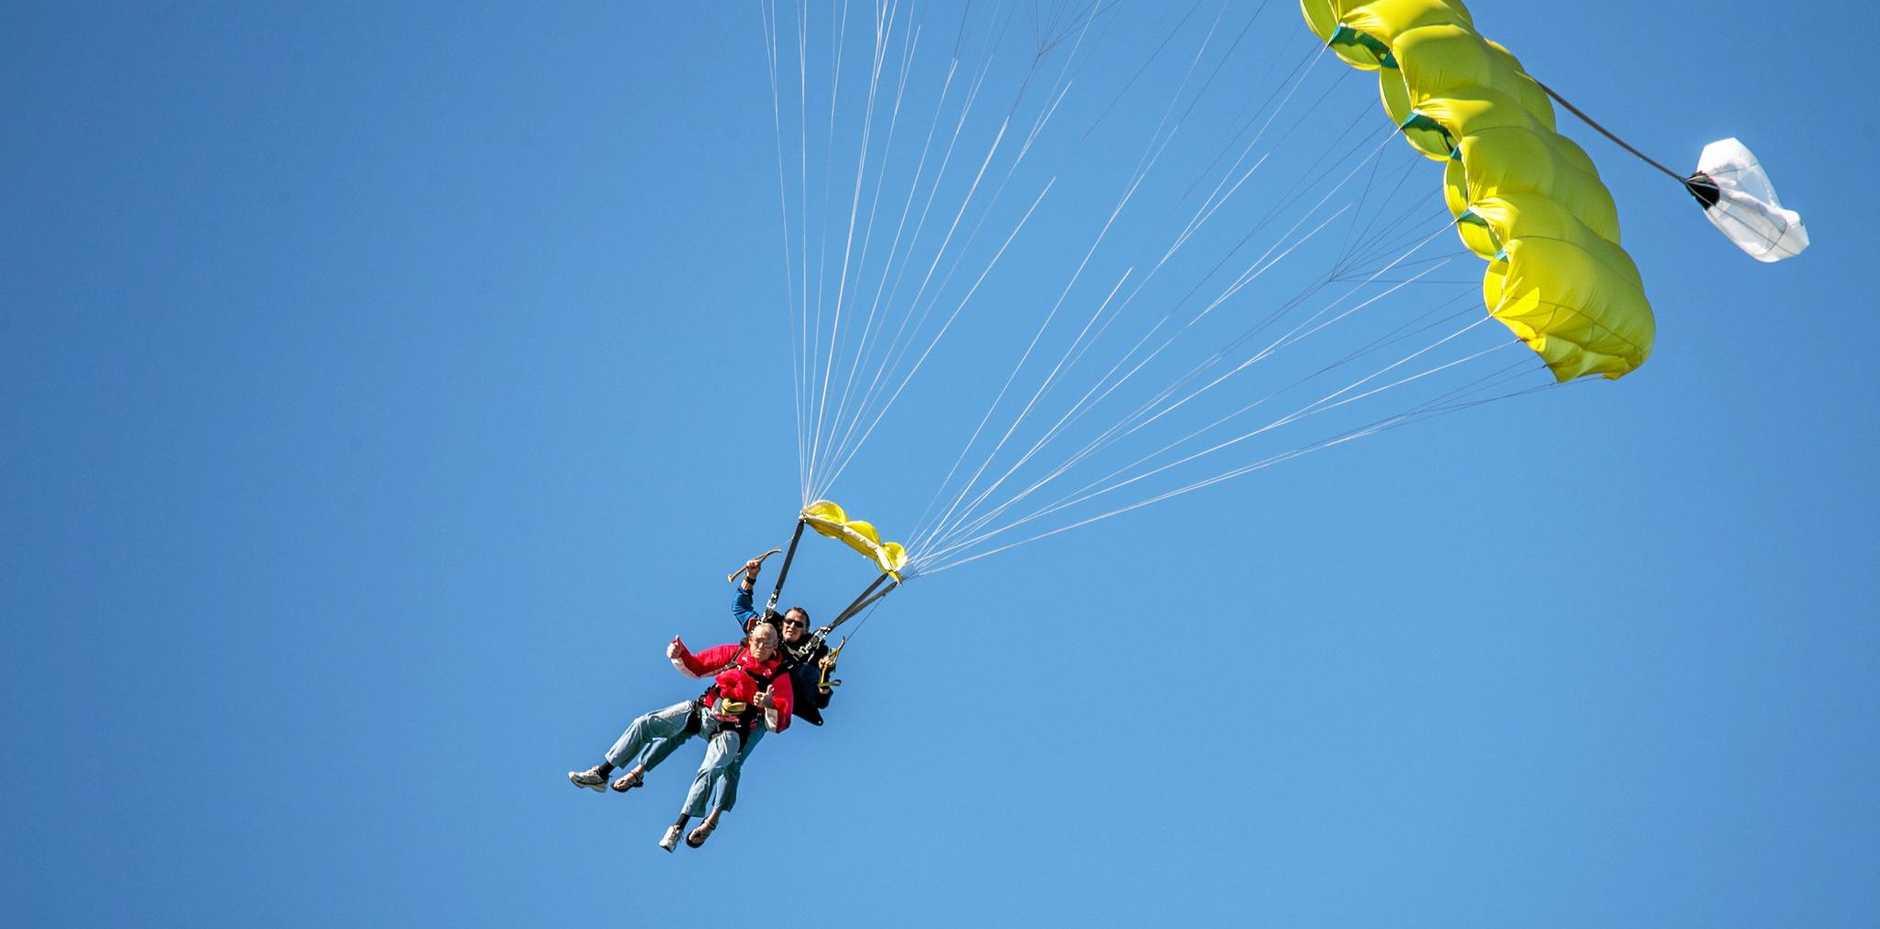 BIRTHDAY BILL: 90 year old William 'Bill' Wilson went skydiving to celebrate his birthday.